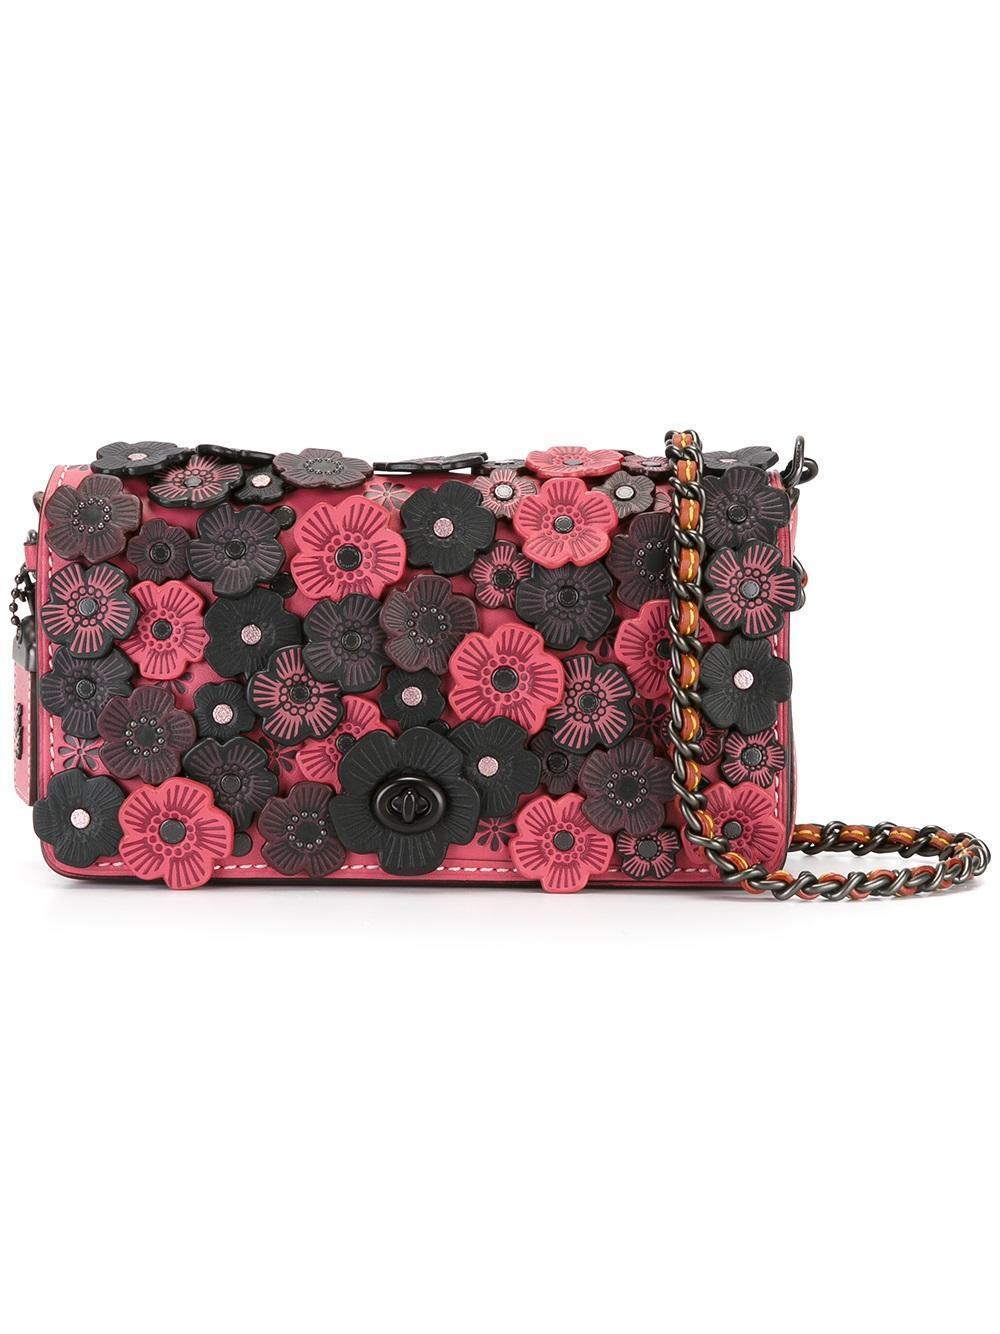 Lyst Coach Flower Embellished Crossbody Bag In Pink